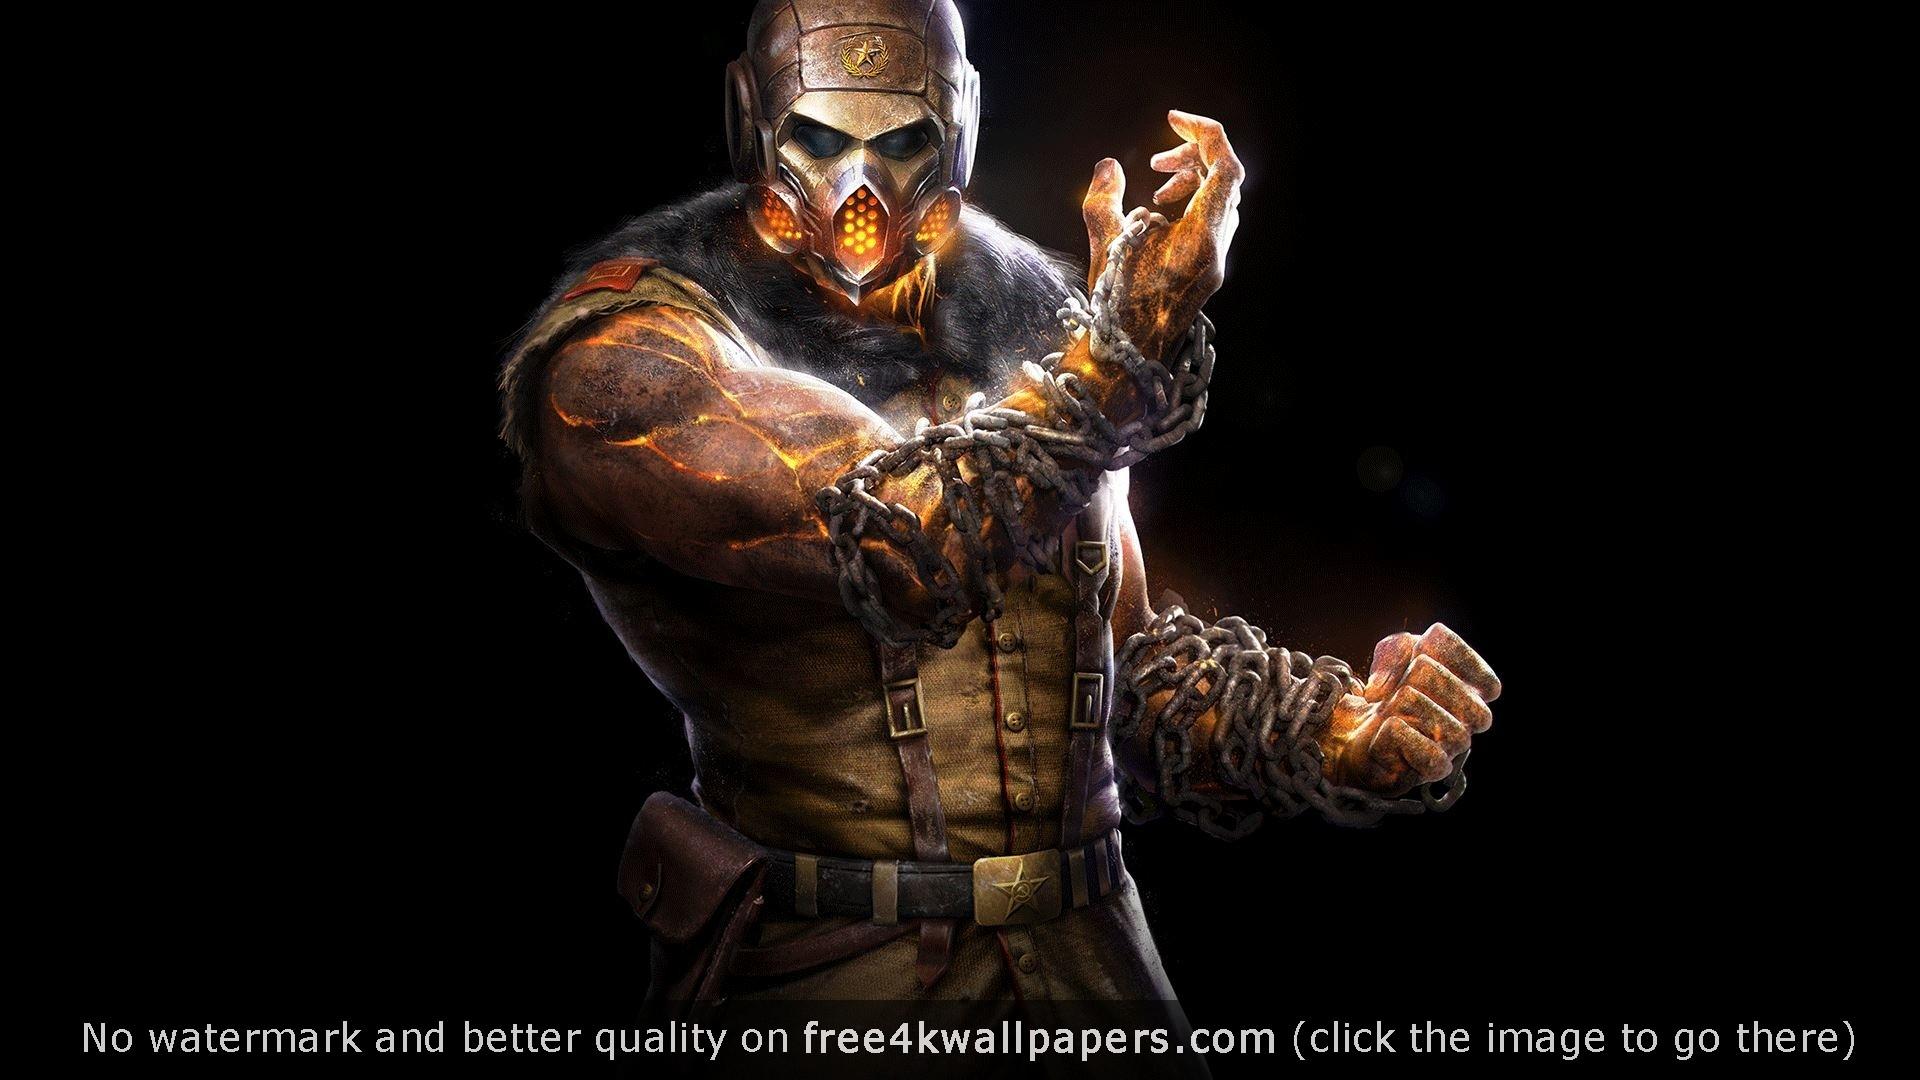 Mortal Kombat X Kold War Scorpion wallpaper